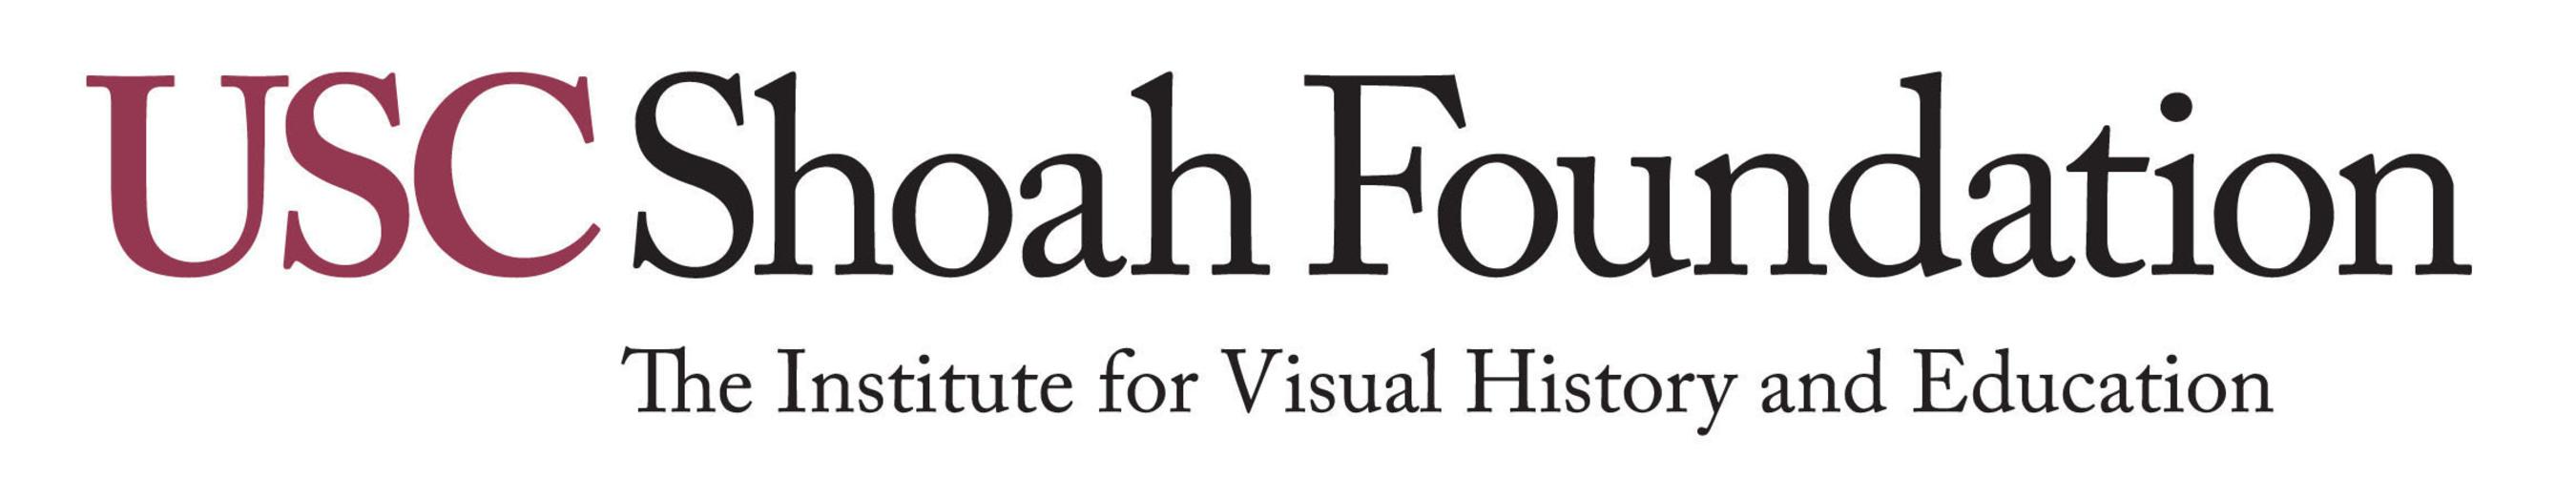 USC Shoah Foundation logo